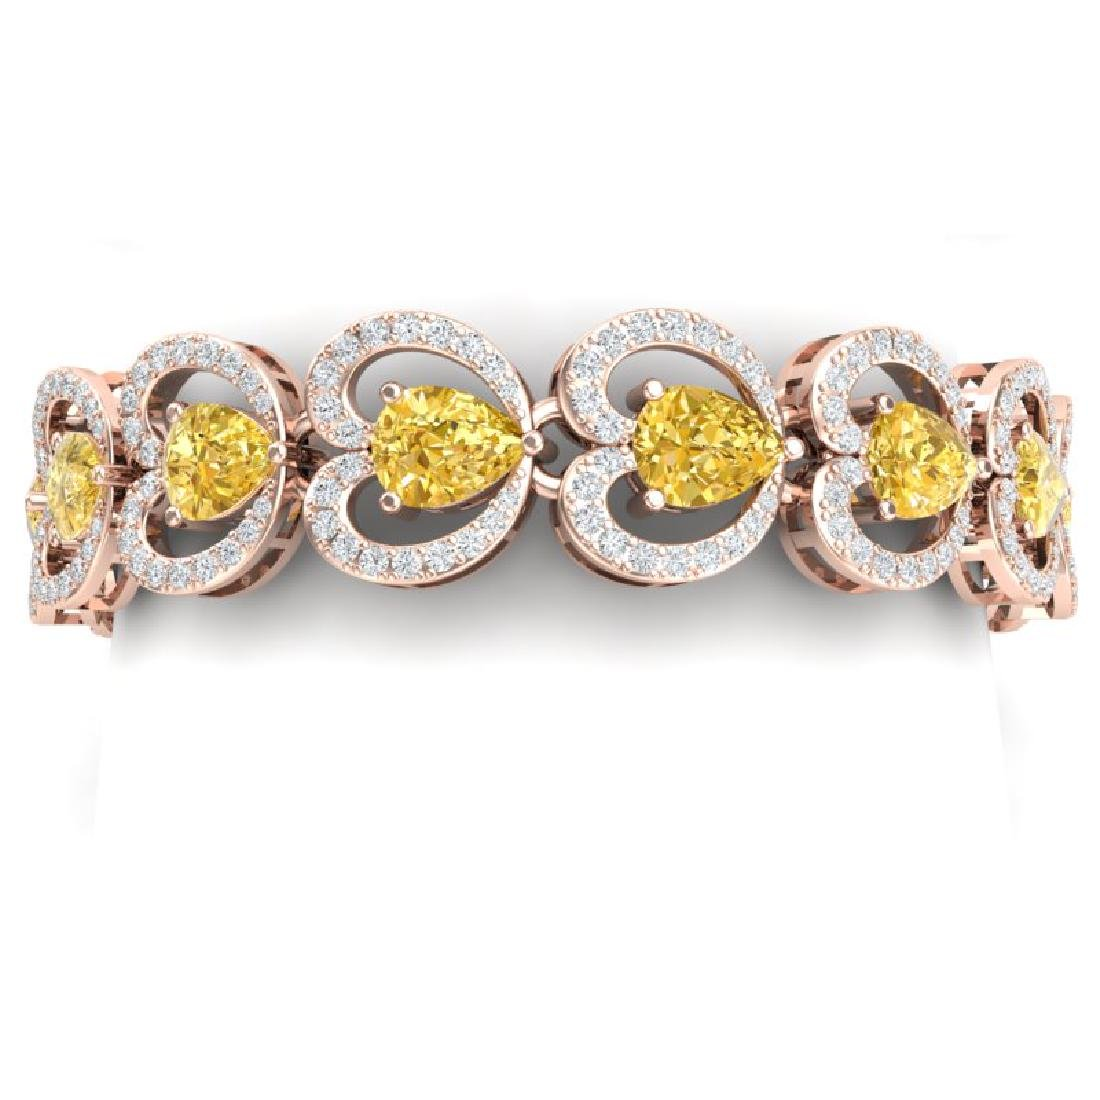 29.14 CTW Royalty Canary Citrine & VS Diamond Bracelet